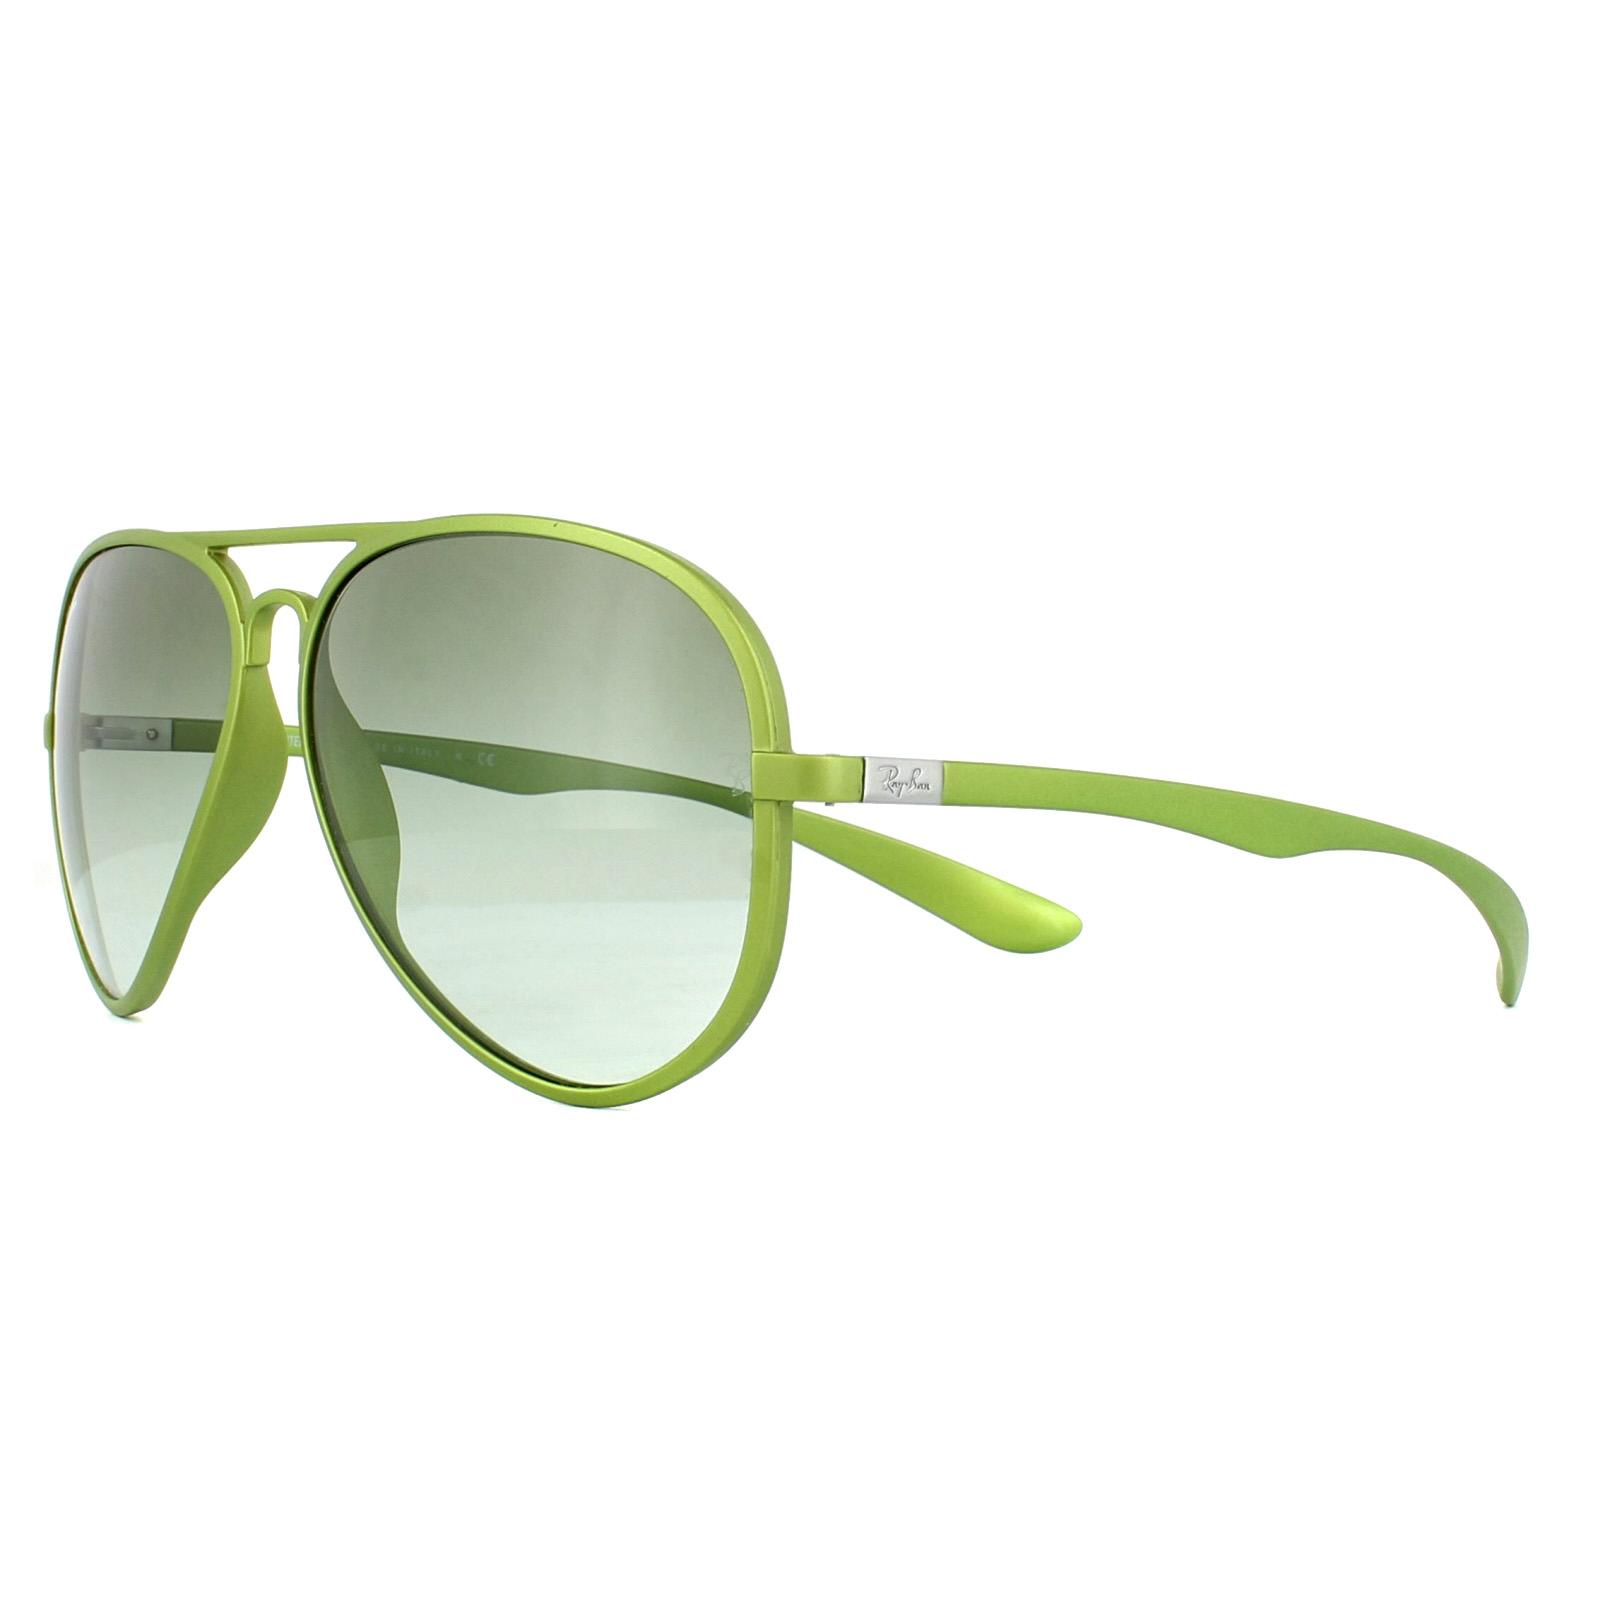 f705ae58b5e ... switzerland sentinel ray ban sunglasses 4180 60868e green green  gradient fec1f 1ecb8